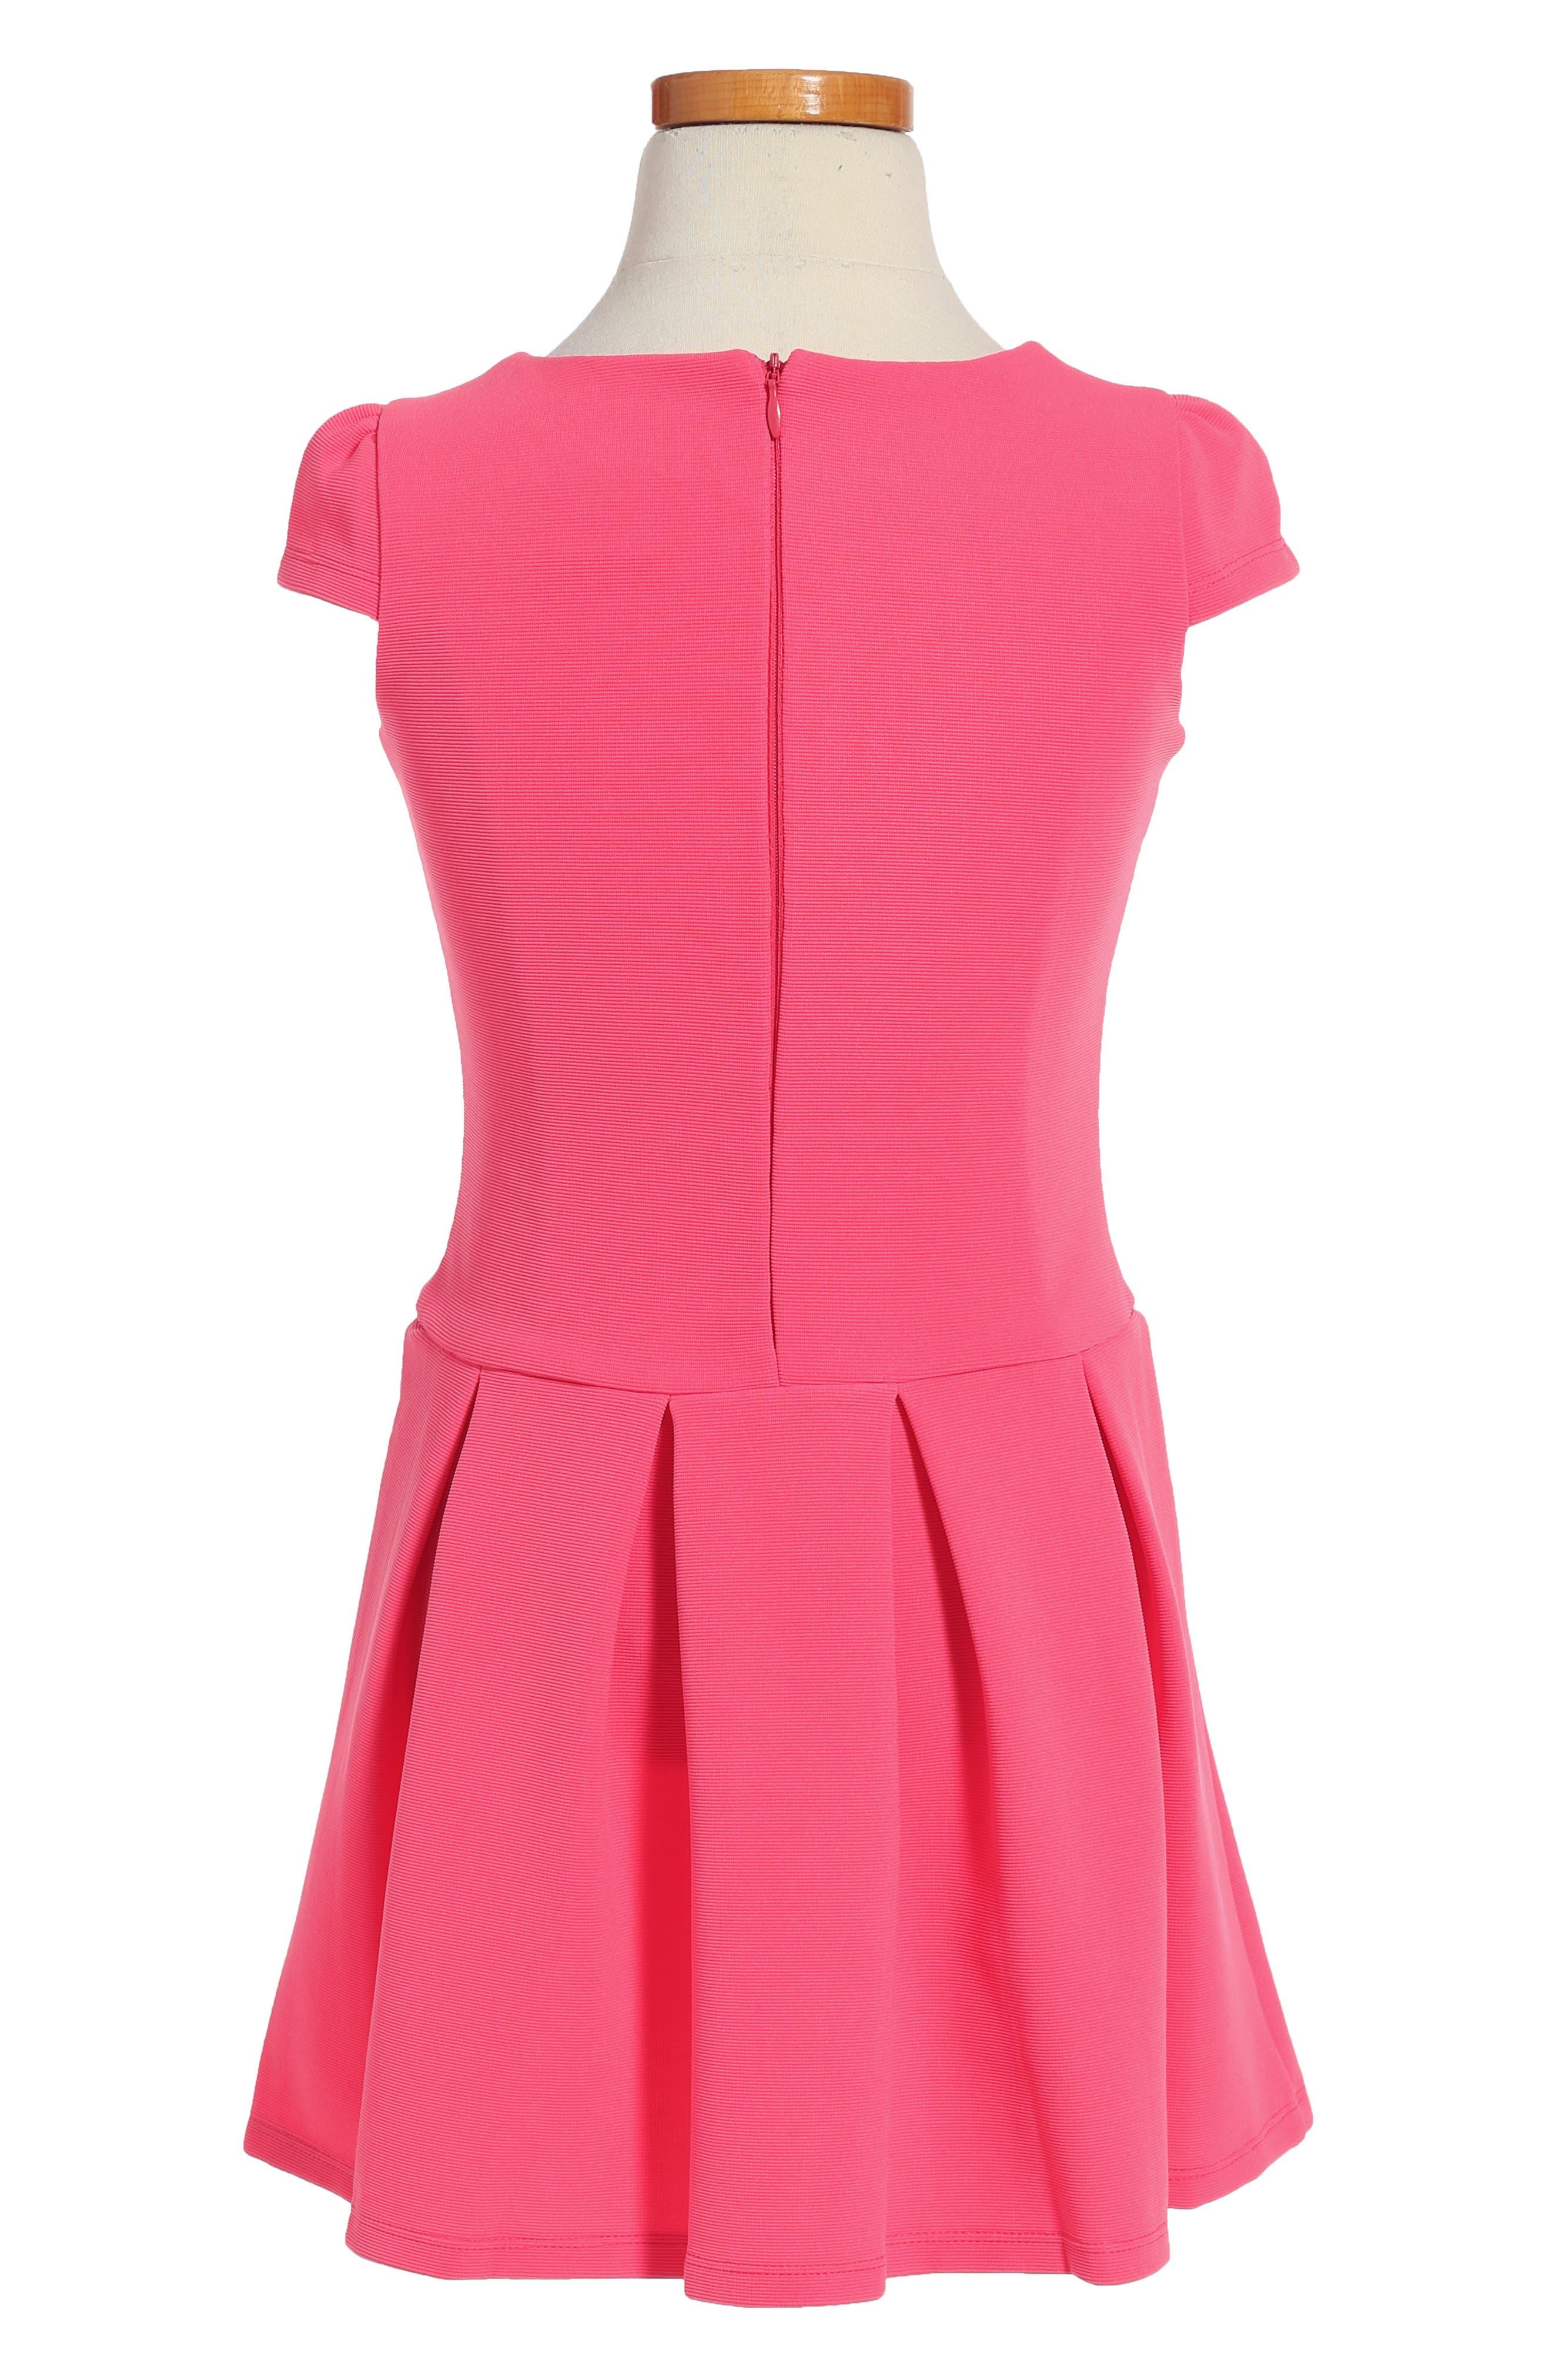 Drop Waist Dress,                             Alternate thumbnail 2, color,                             650